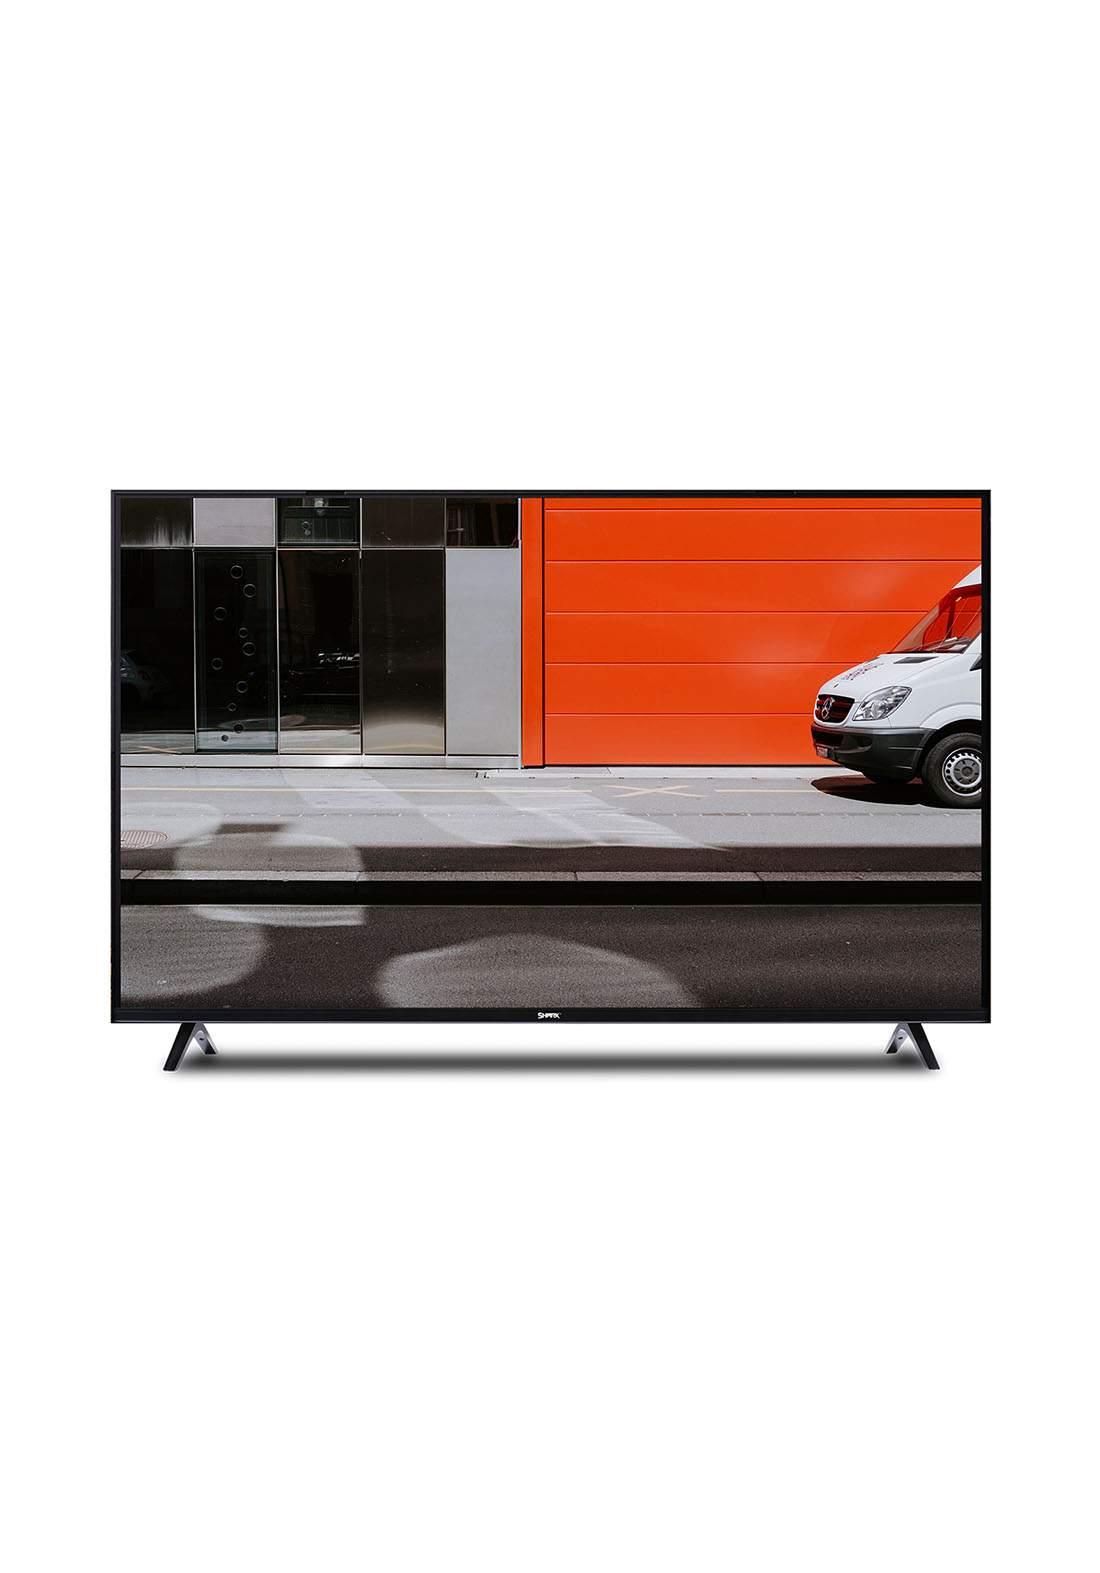 Shark Led TV - 42inch شاشة